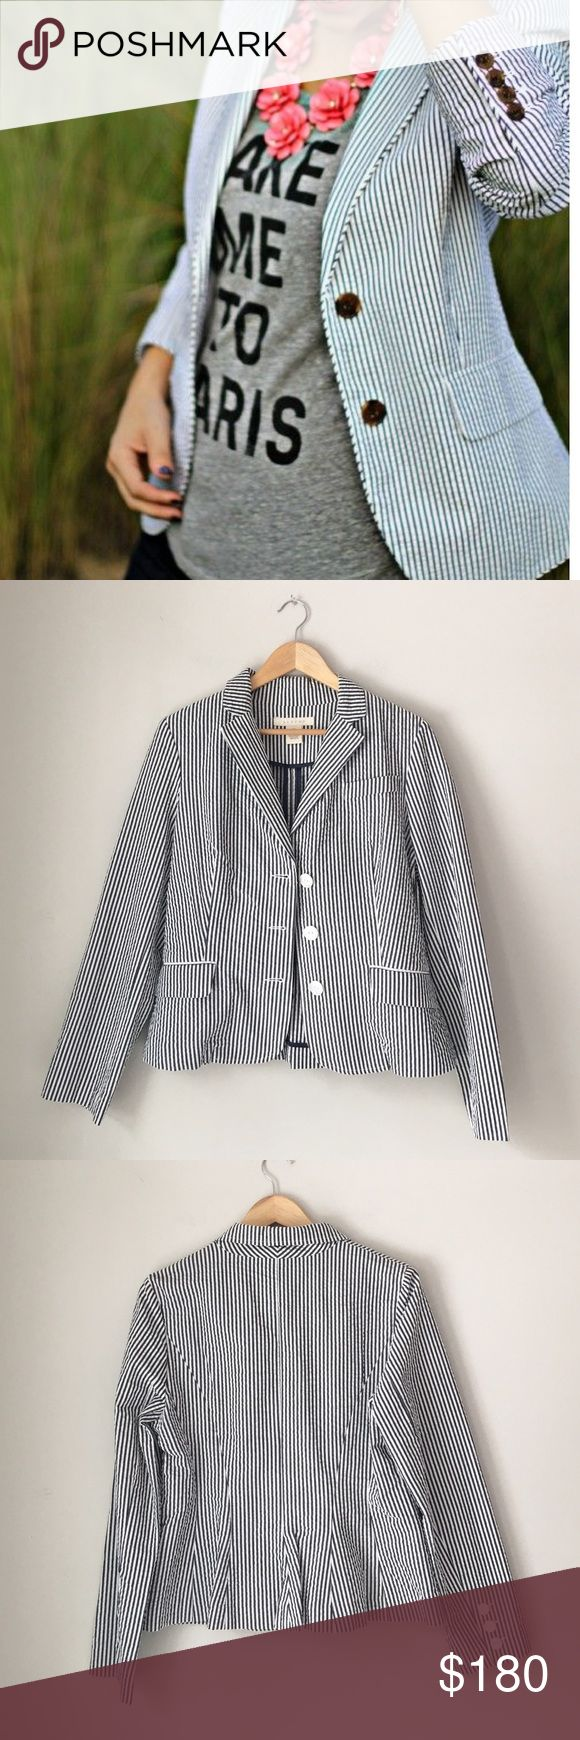 Sandro Gray/Blue Seersucker Blazer Gorgeous grayish/midnight Seersucker blazer by Parisian designer Sandro. 100% cotton. Size Medium. NWOT. Sandro Jackets & Coats Blazers